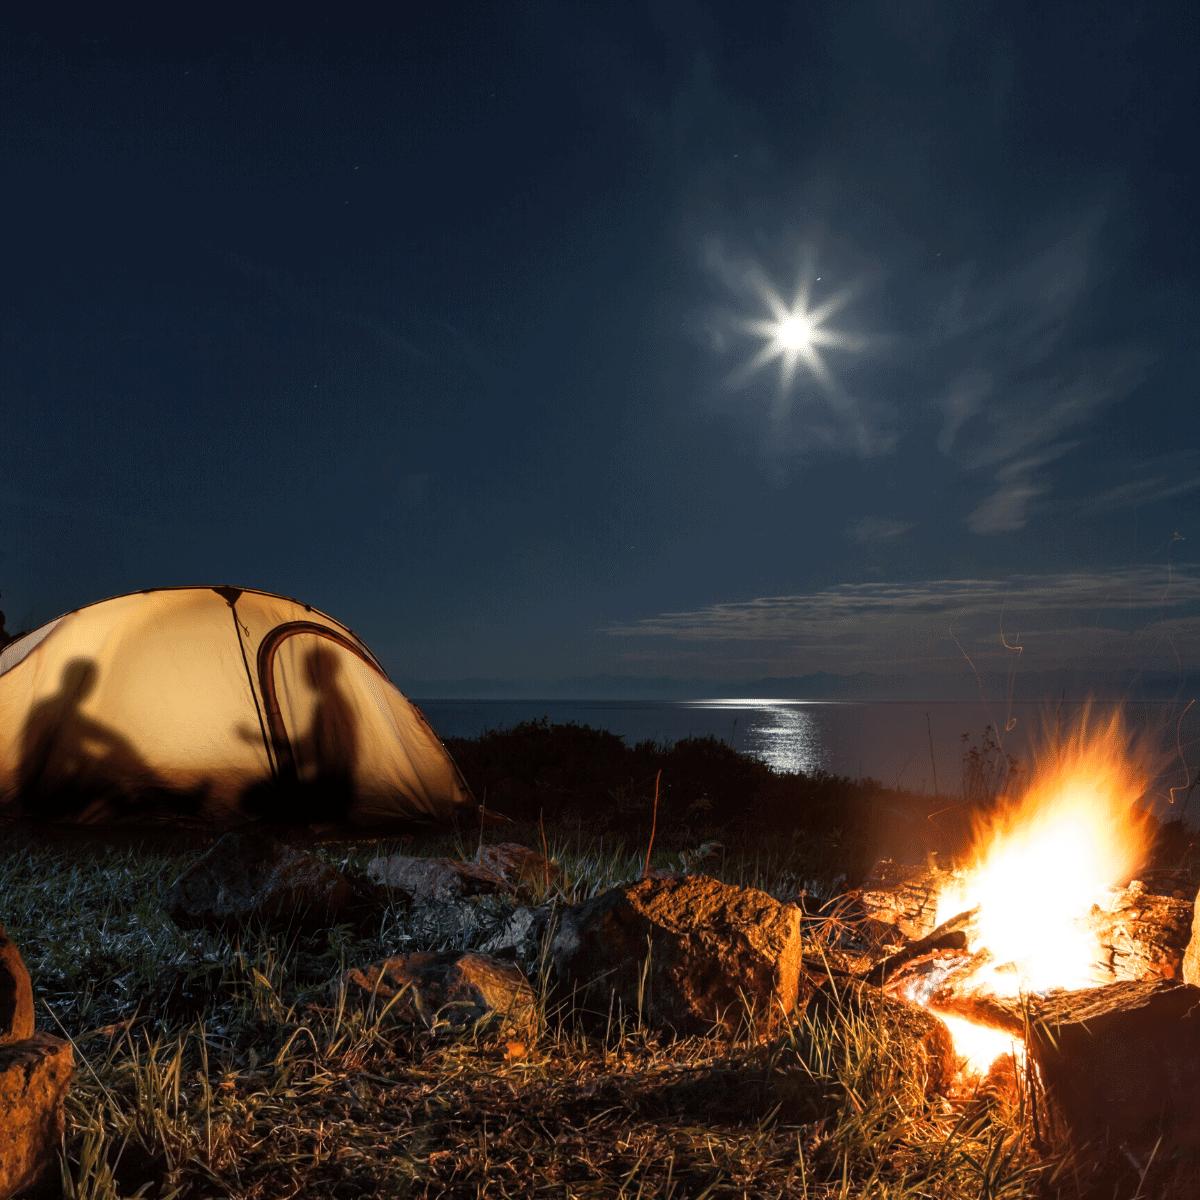 Keto Camping No fuss way to enjoy outdoors & stay in Ketosis